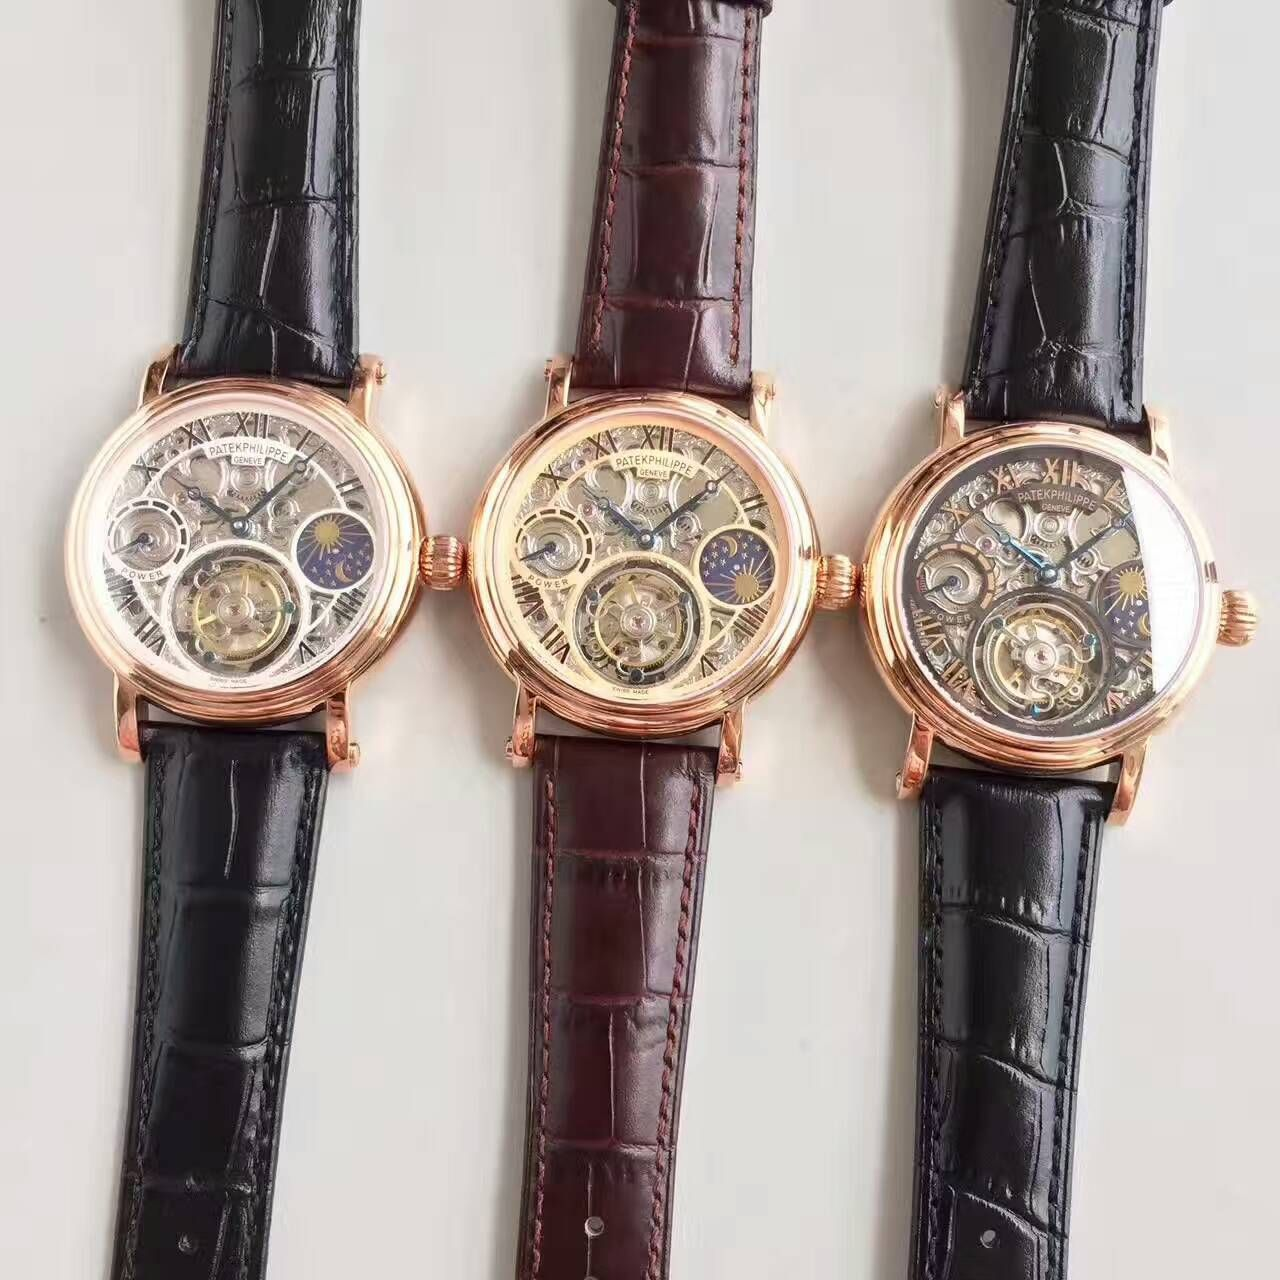 【TF厂一比一精仿手表】百达翡丽镂空雕花动力星辰真陀飞轮腕表 / BD202